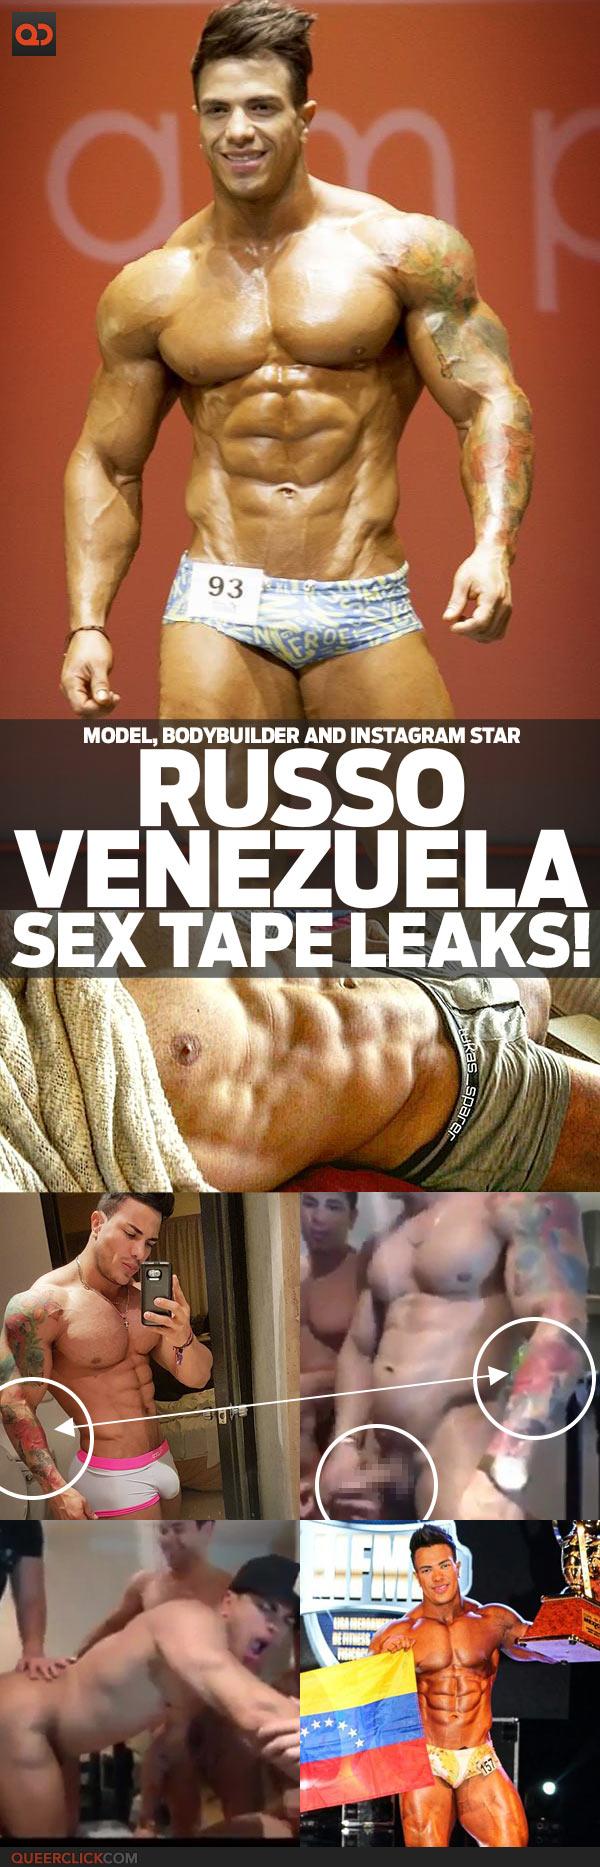 Russo Venezuela, Model, Bodybuilder And Instagram Star, Sex Tape Leaks!